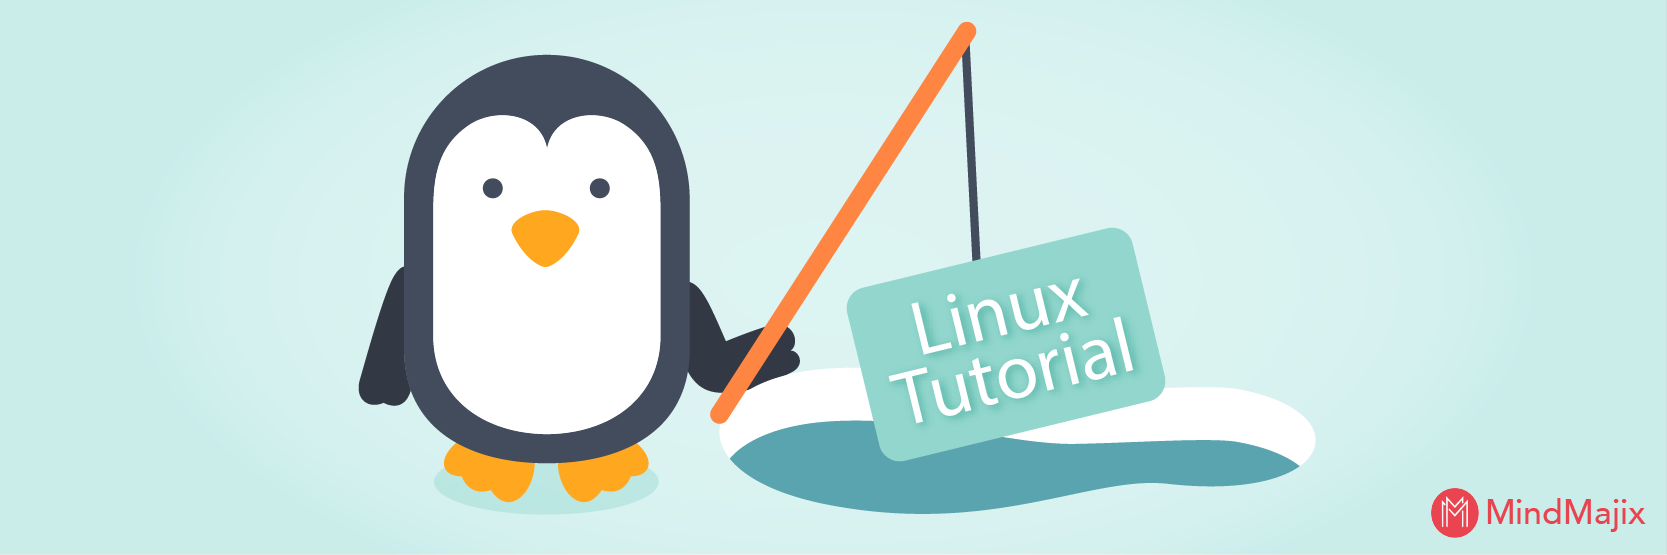 linux tutorial